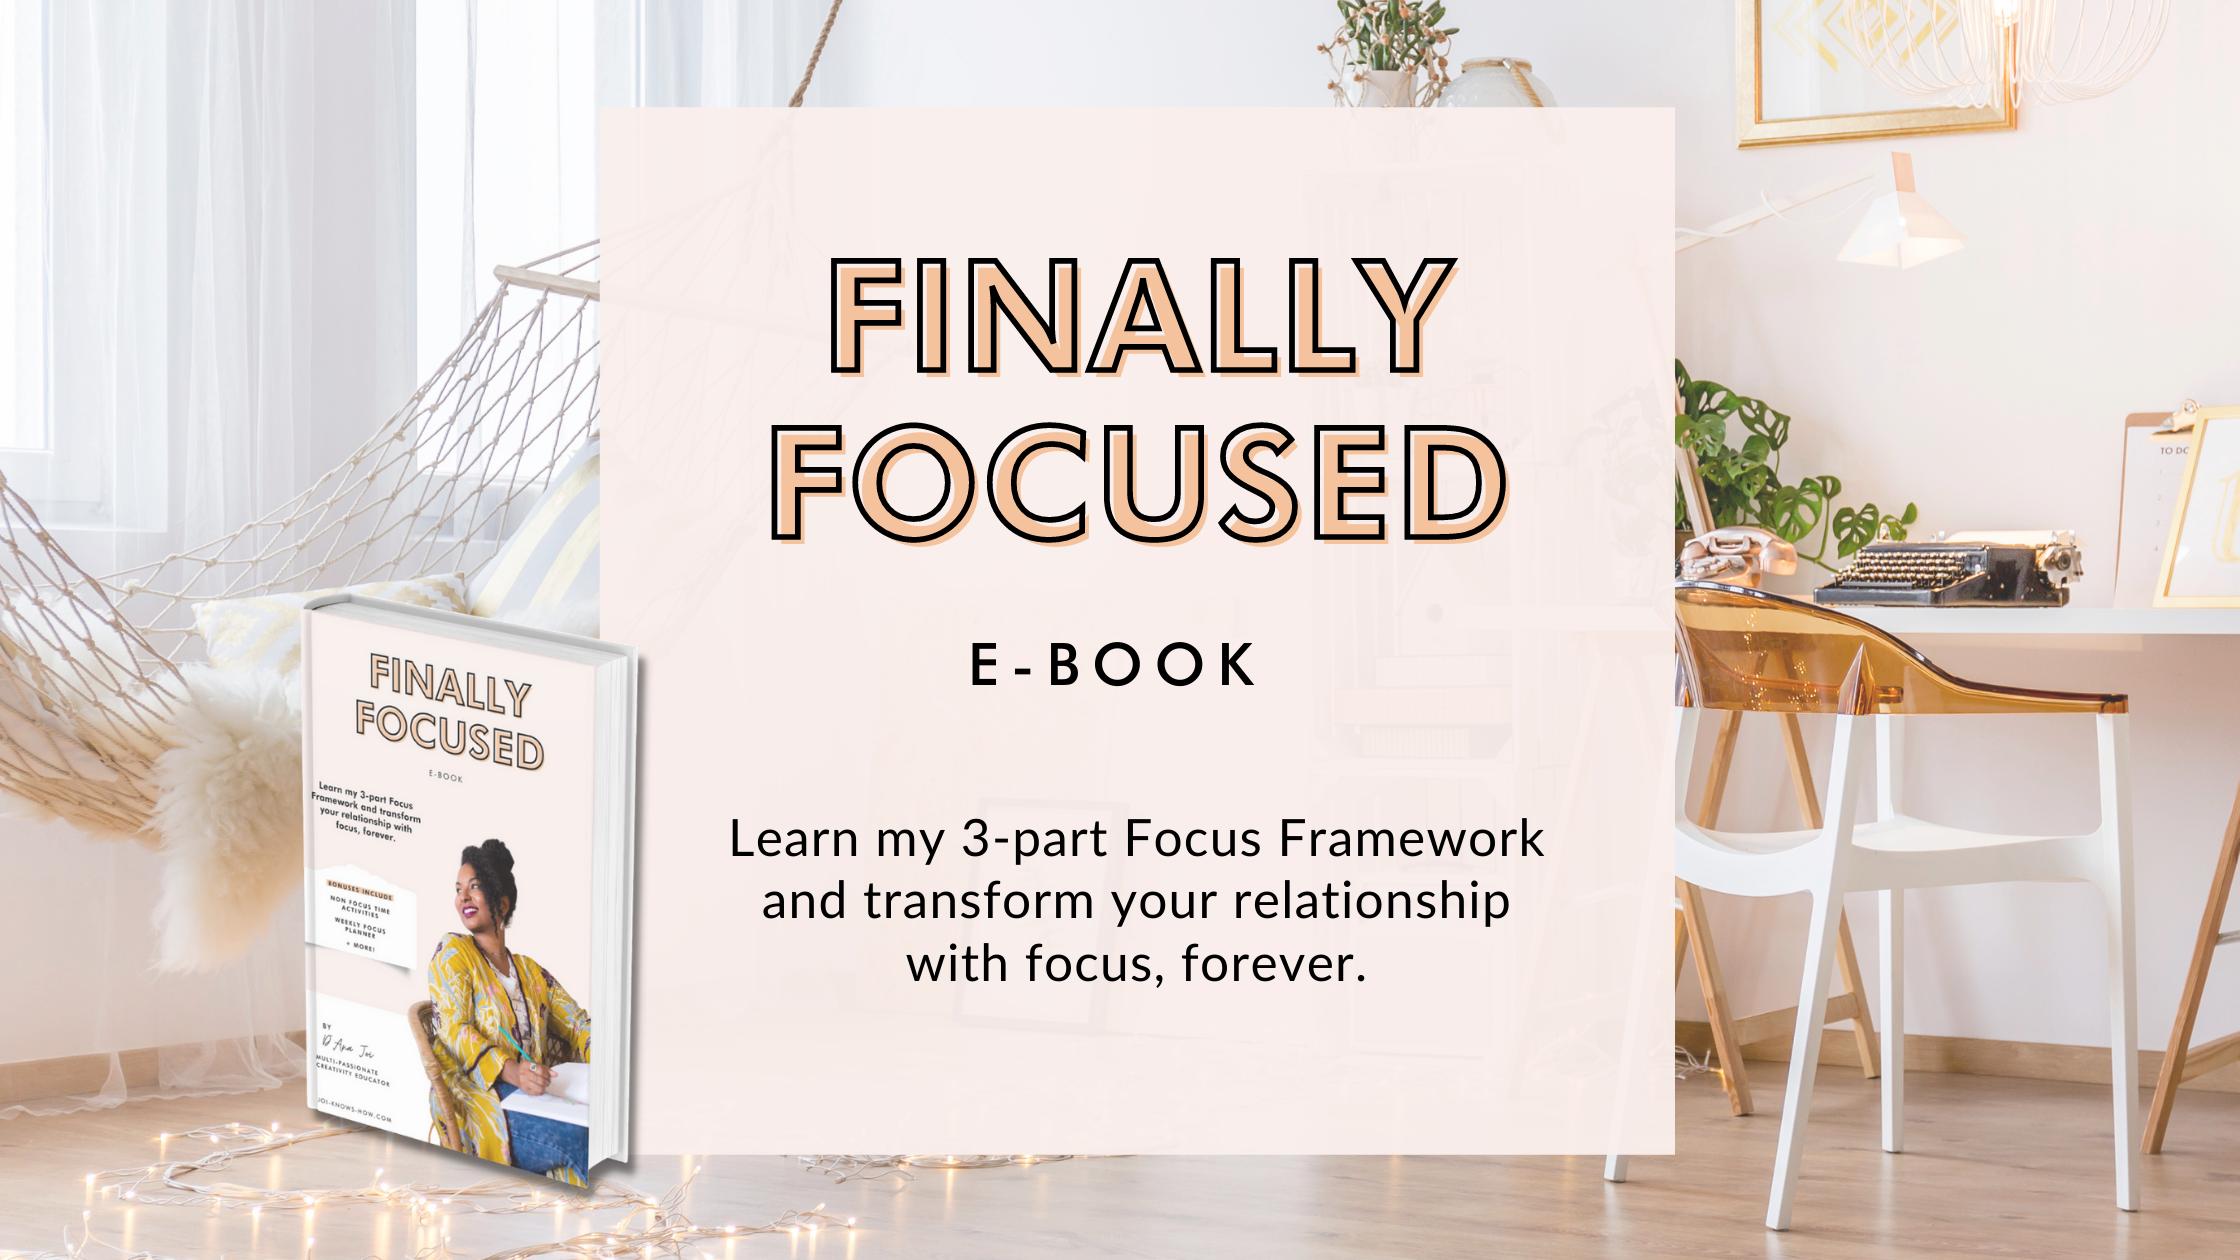 Finally Focused e-book